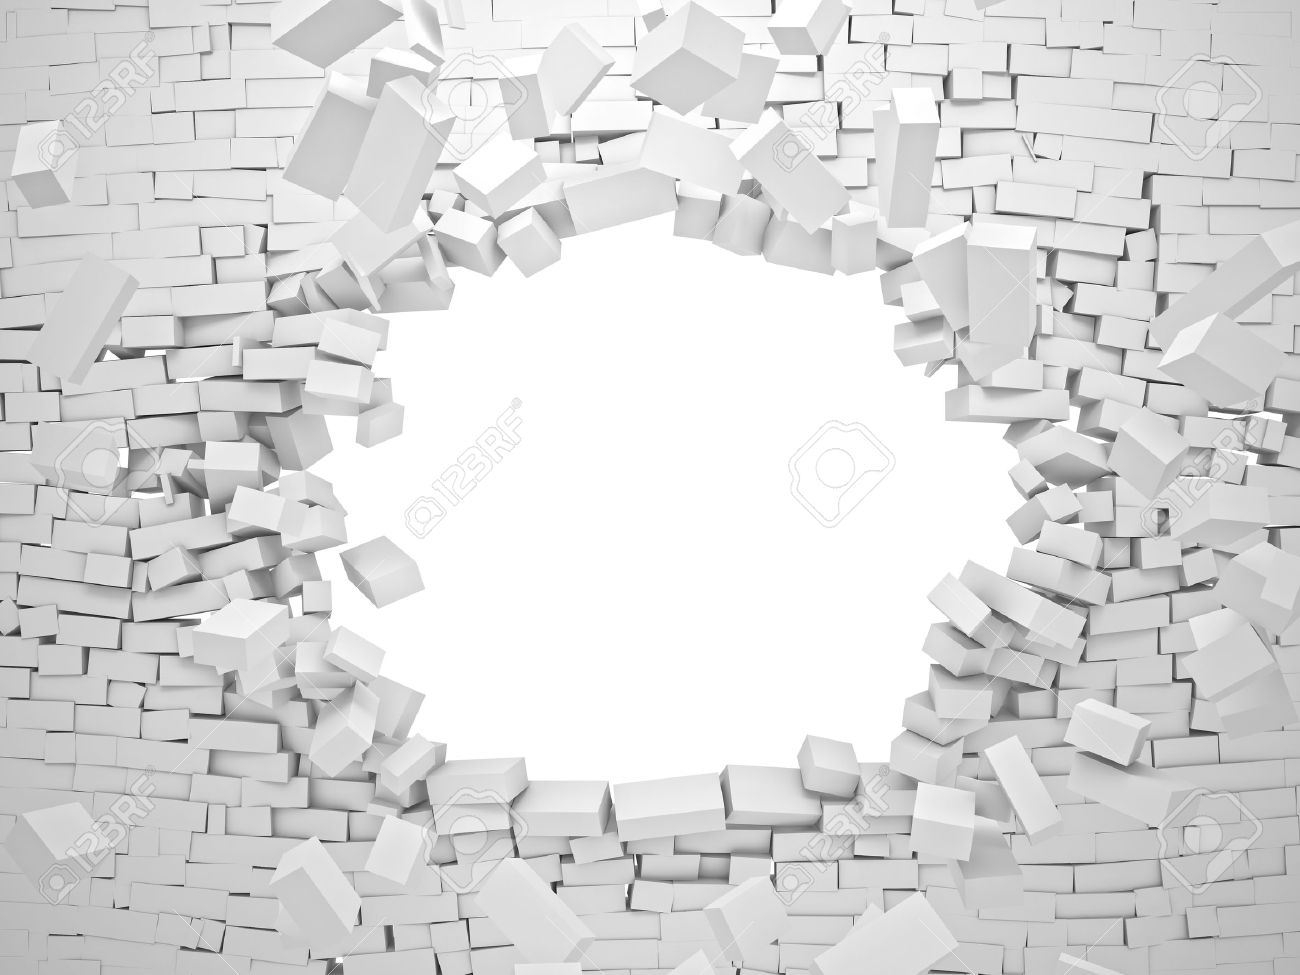 breaking wall brick 3d image - 41045765